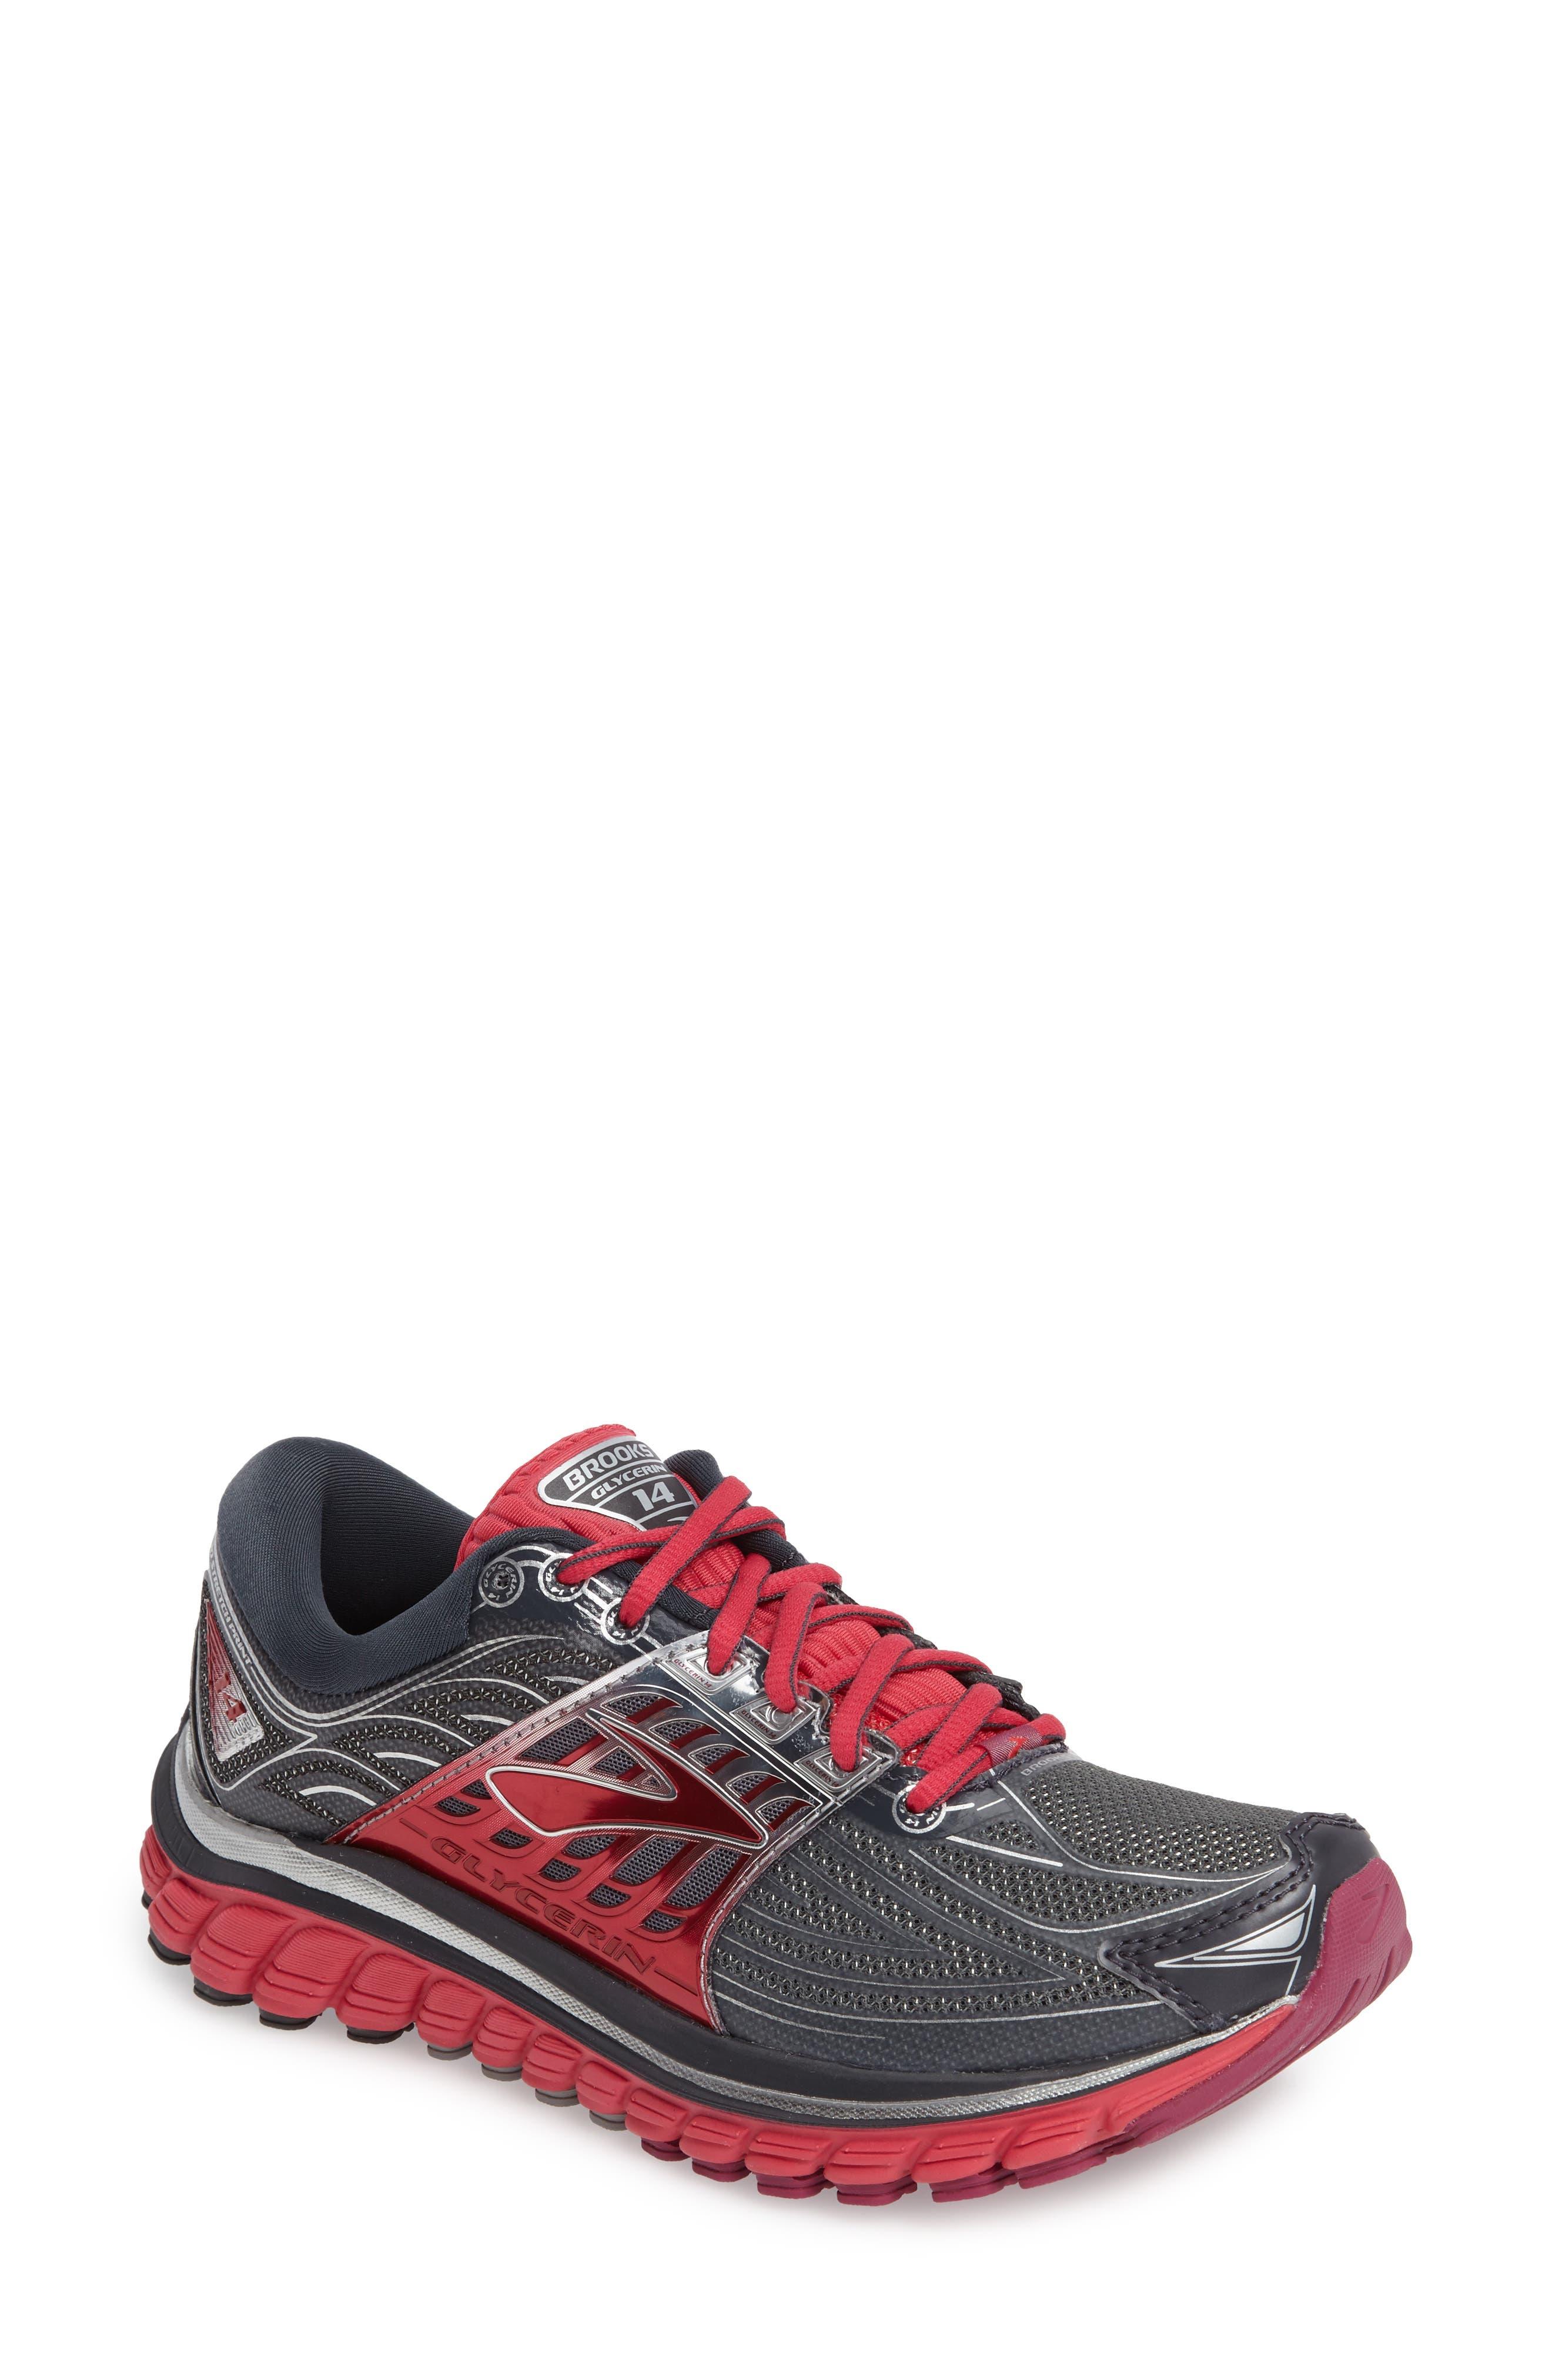 BROOKS 'Glycerin 14' Running Shoe, Main, color, 093